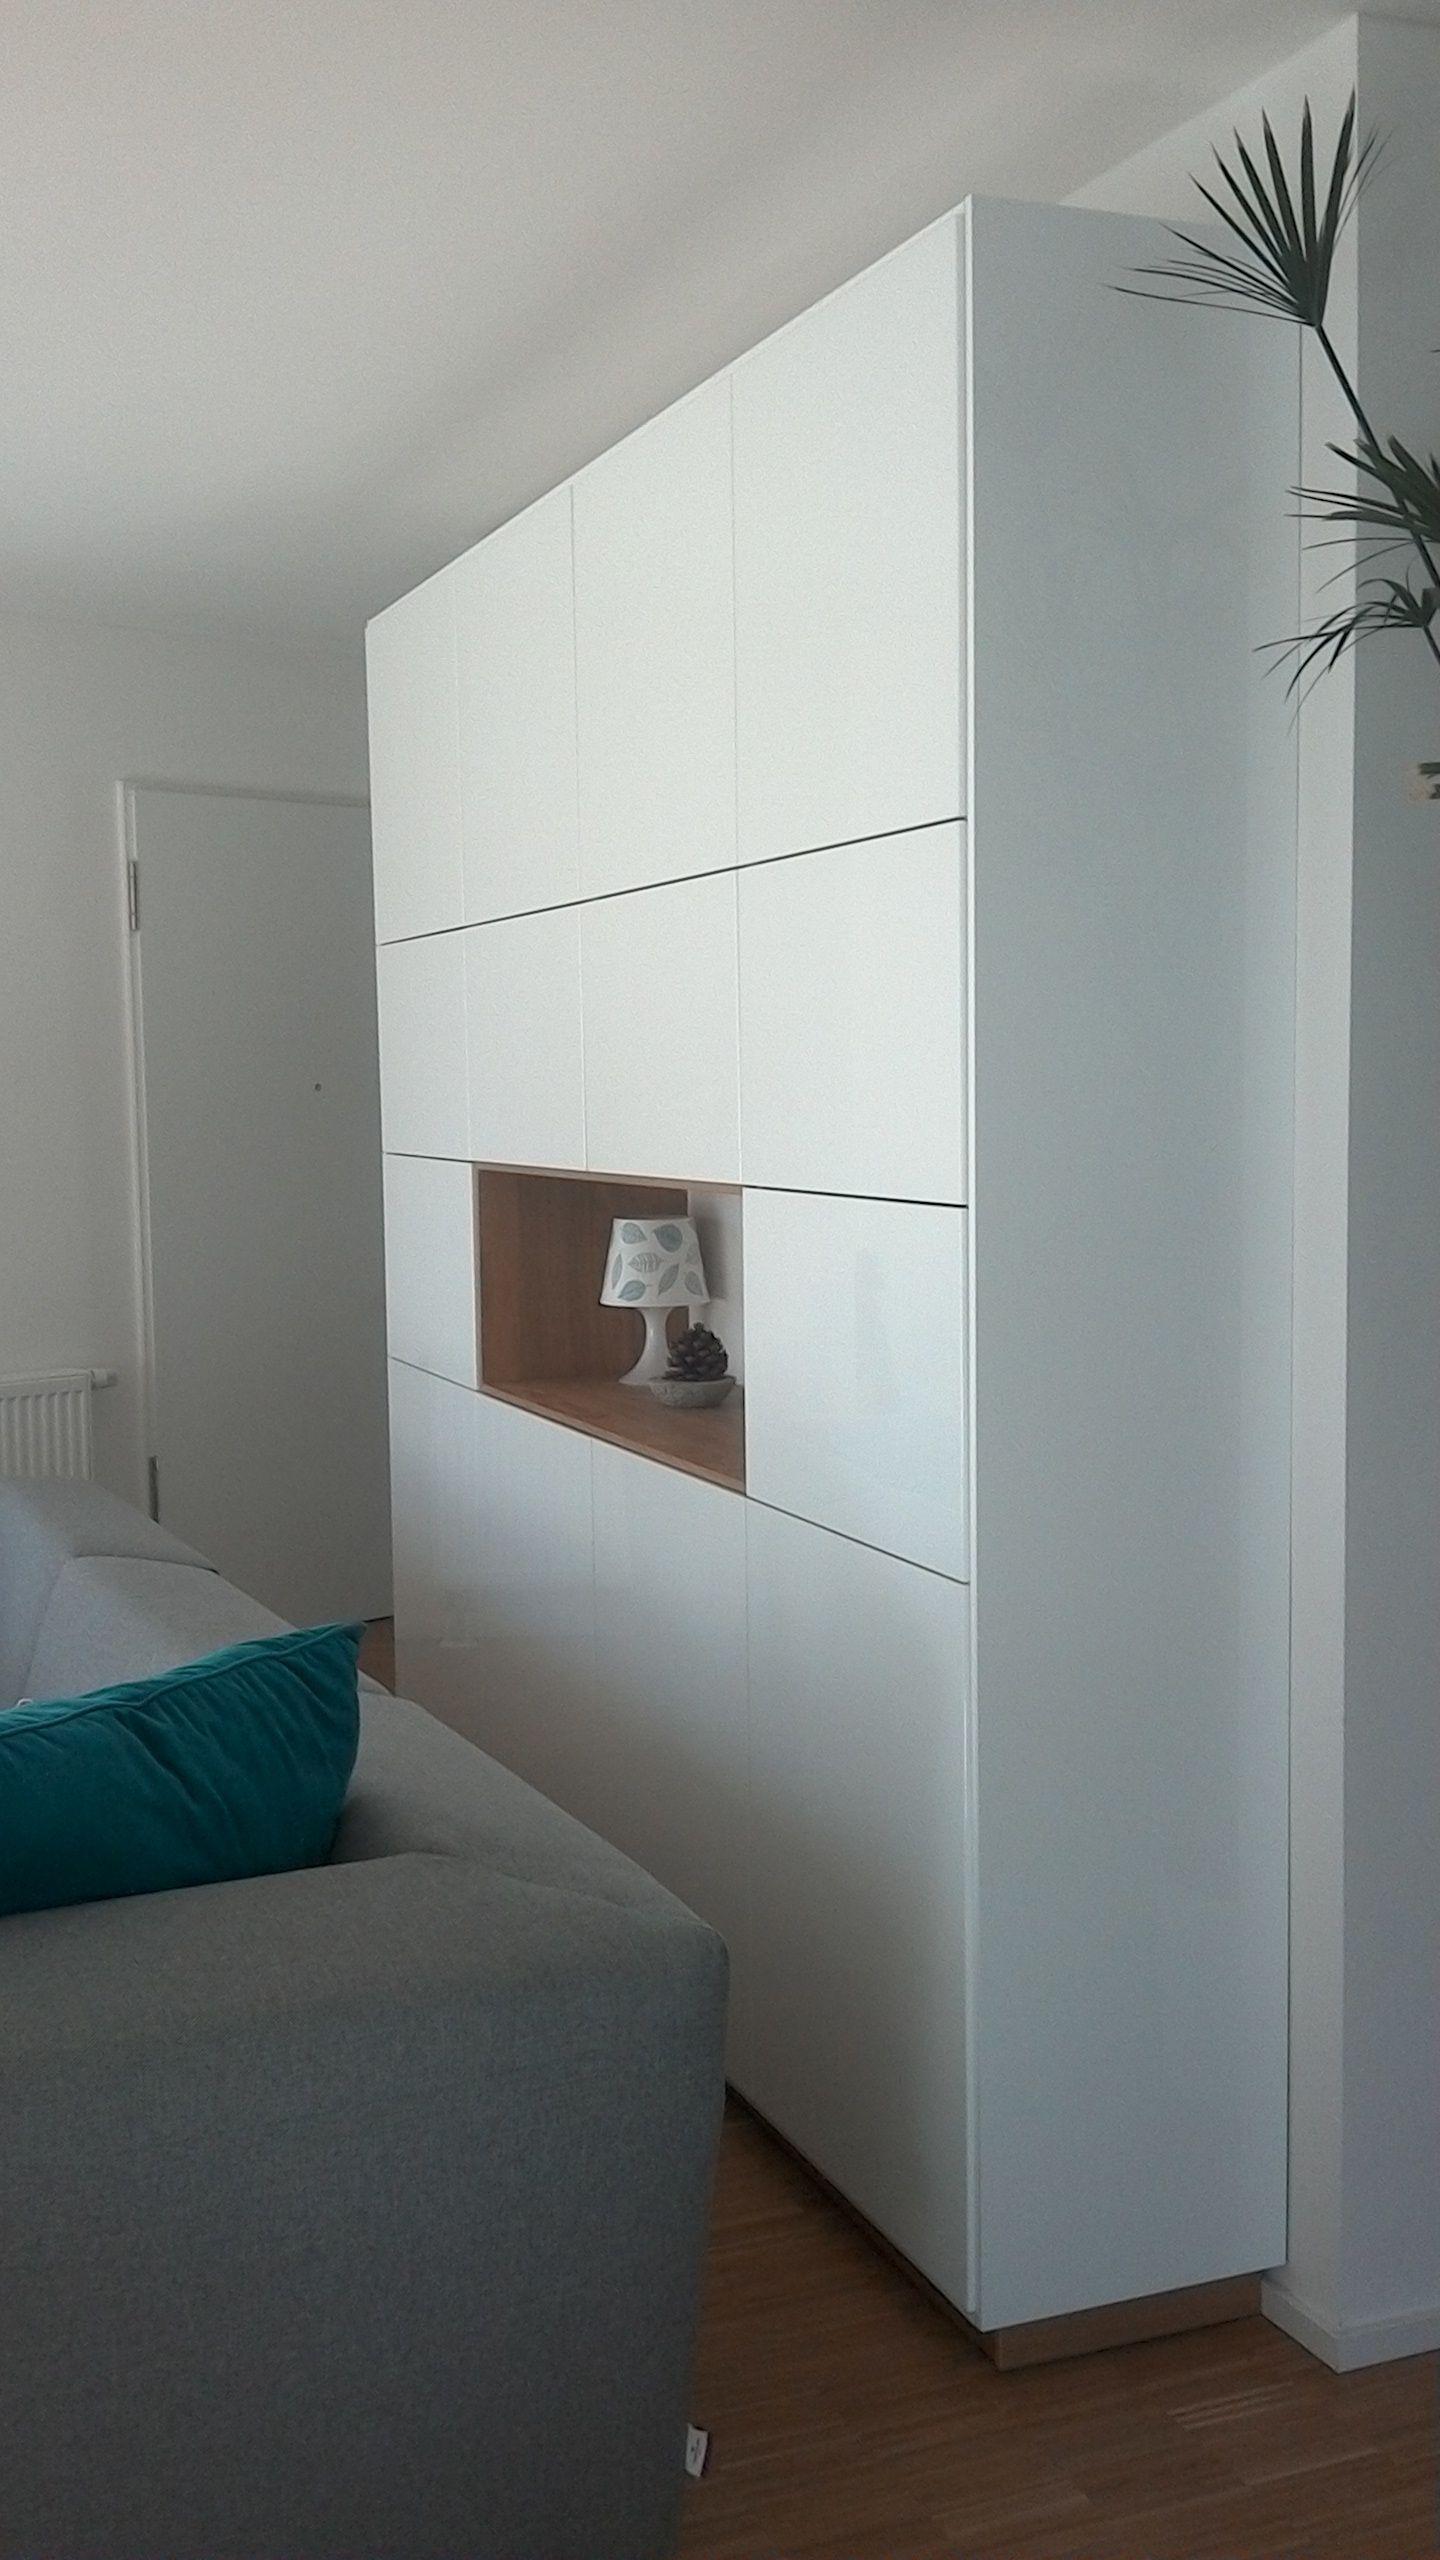 Ikea Method Ringhult Plus Hyttan Als Wohnzimmerschrank Woonkamerkasten Ikea Woonkamer Kast Woonkamer